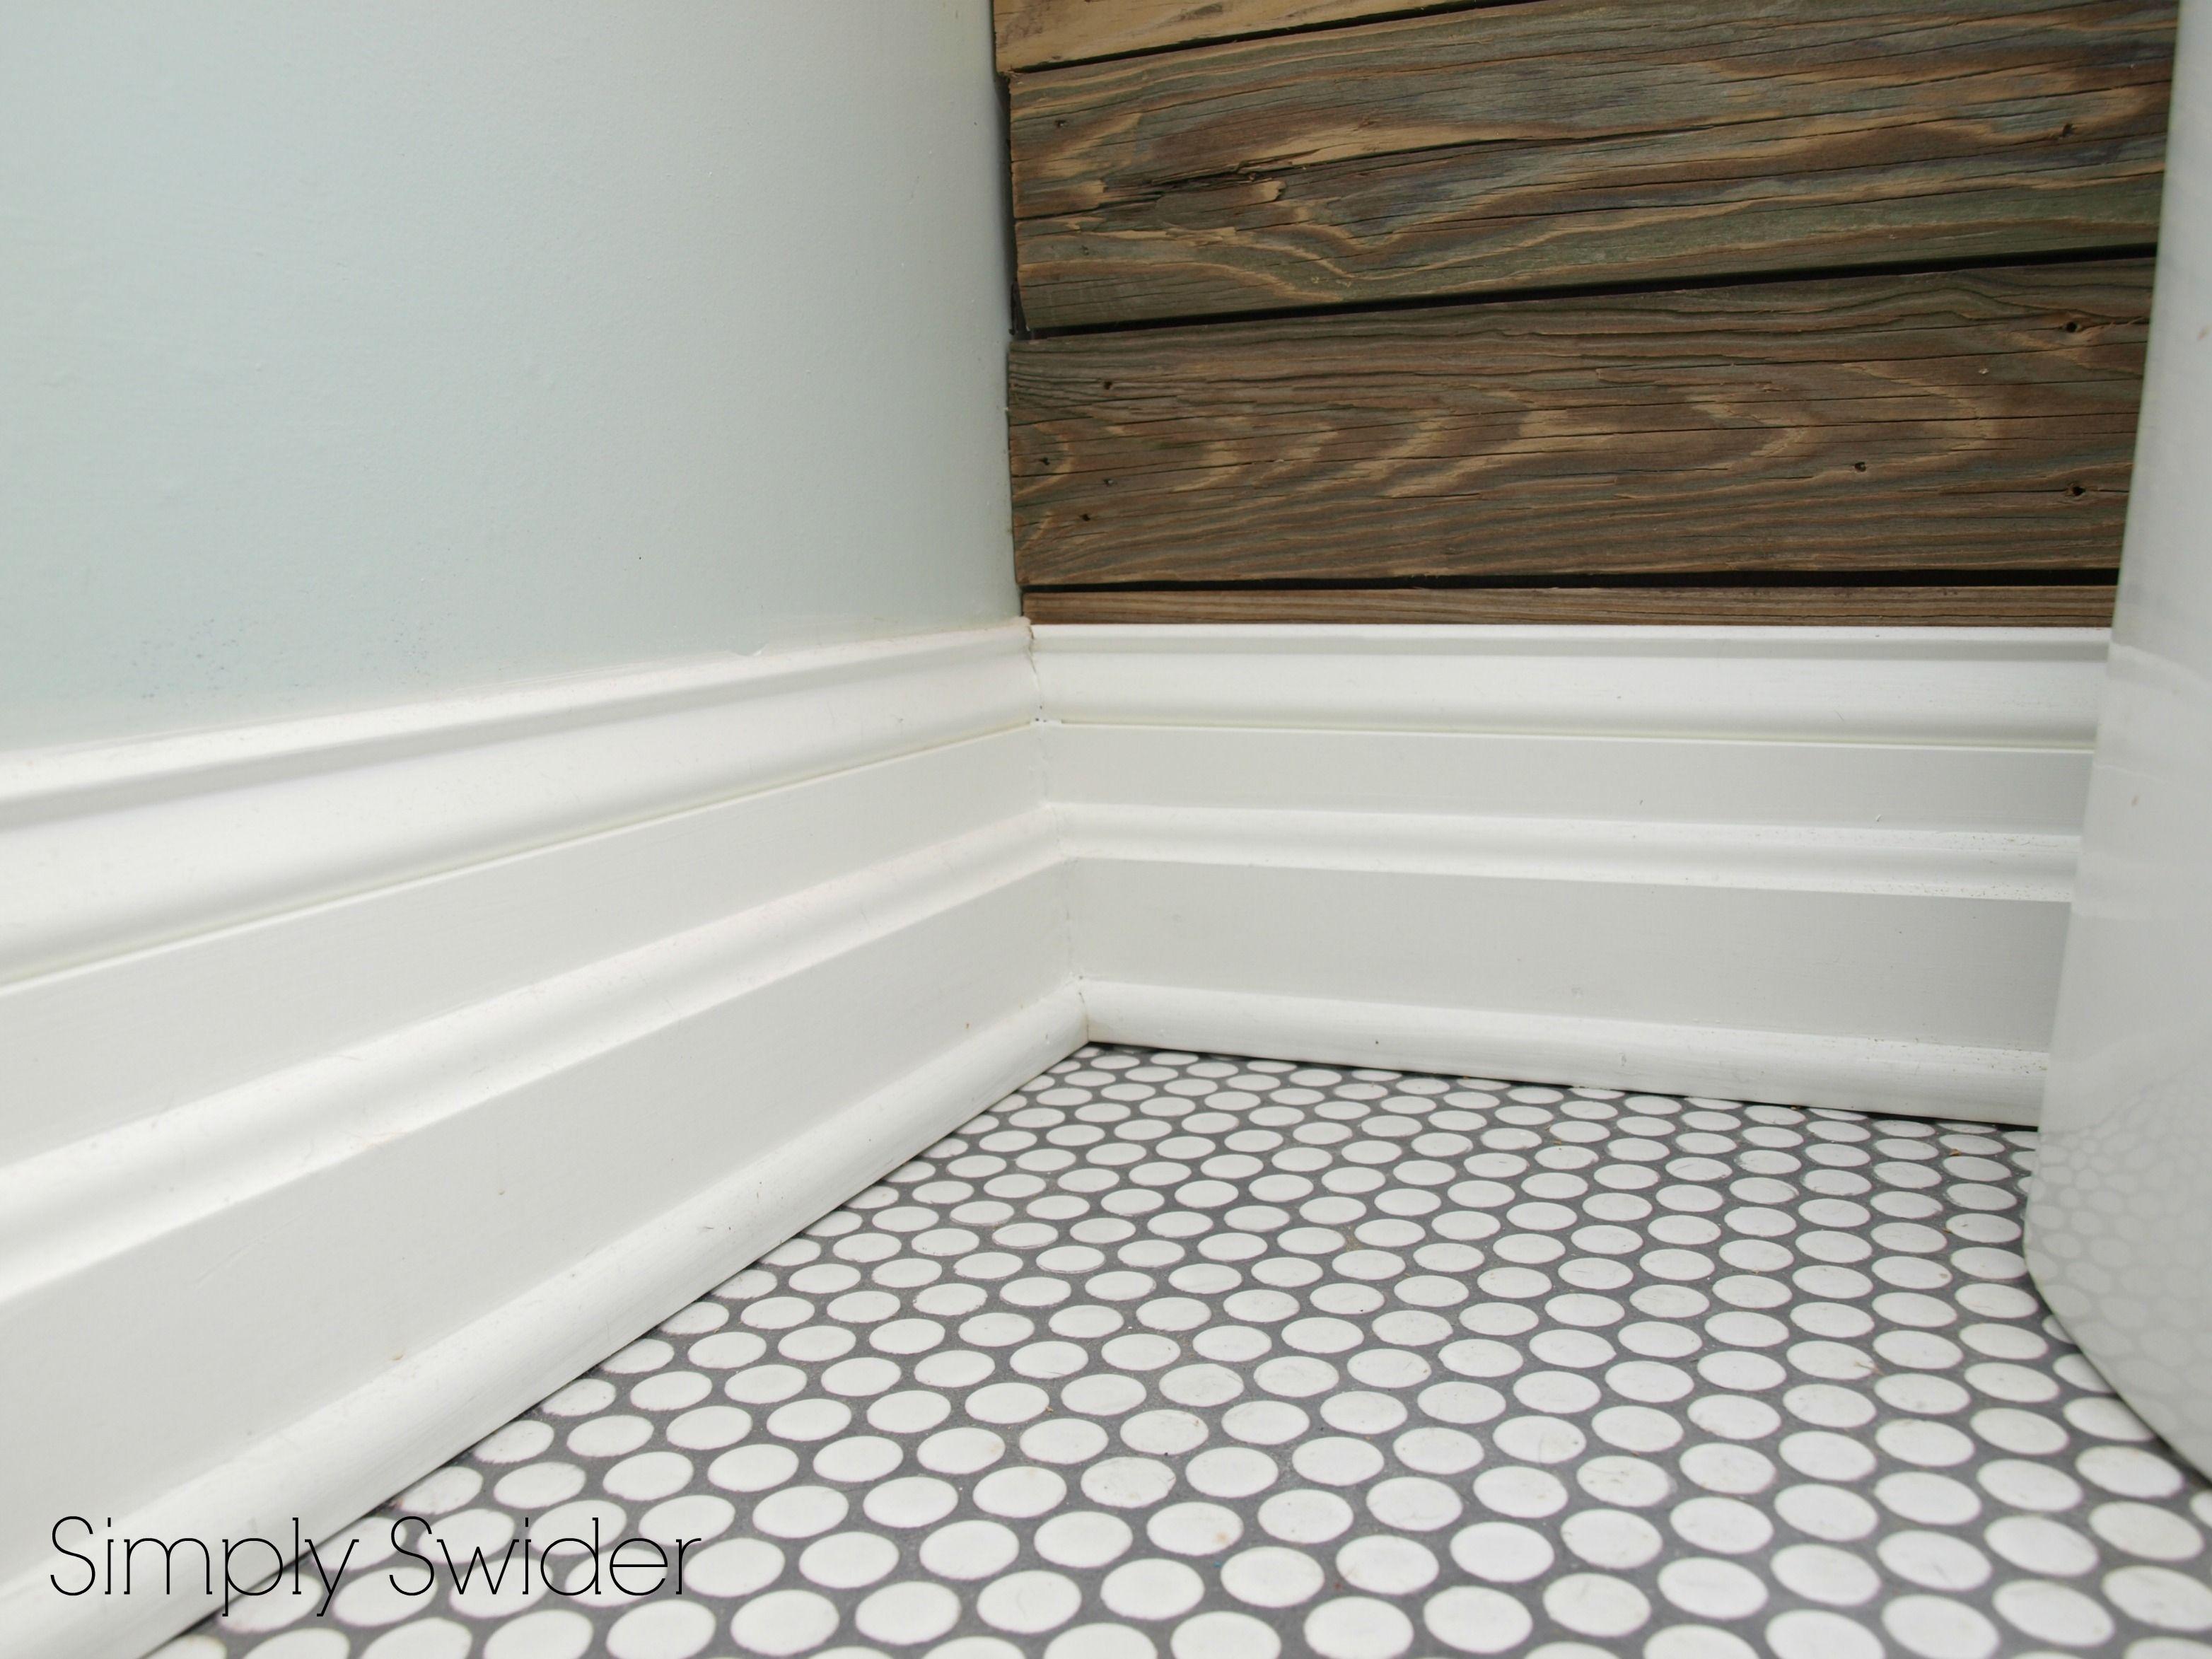 Gray Penny Tile Bathroom Floor Tiles Flooring Gray Tile Bathroom